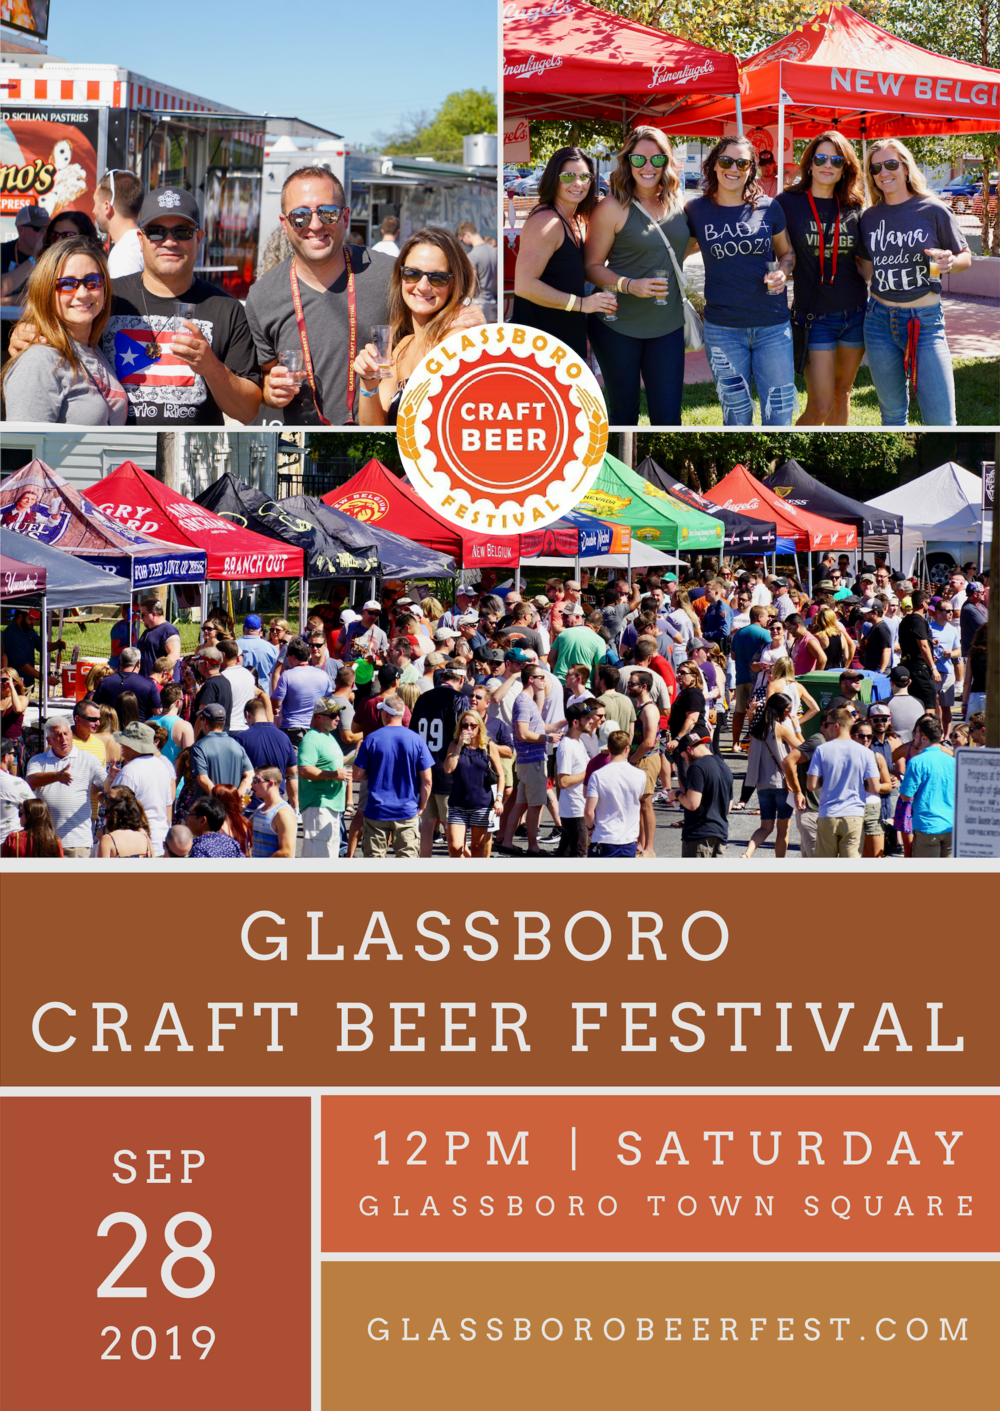 glassboro craft beer festival 2019.png